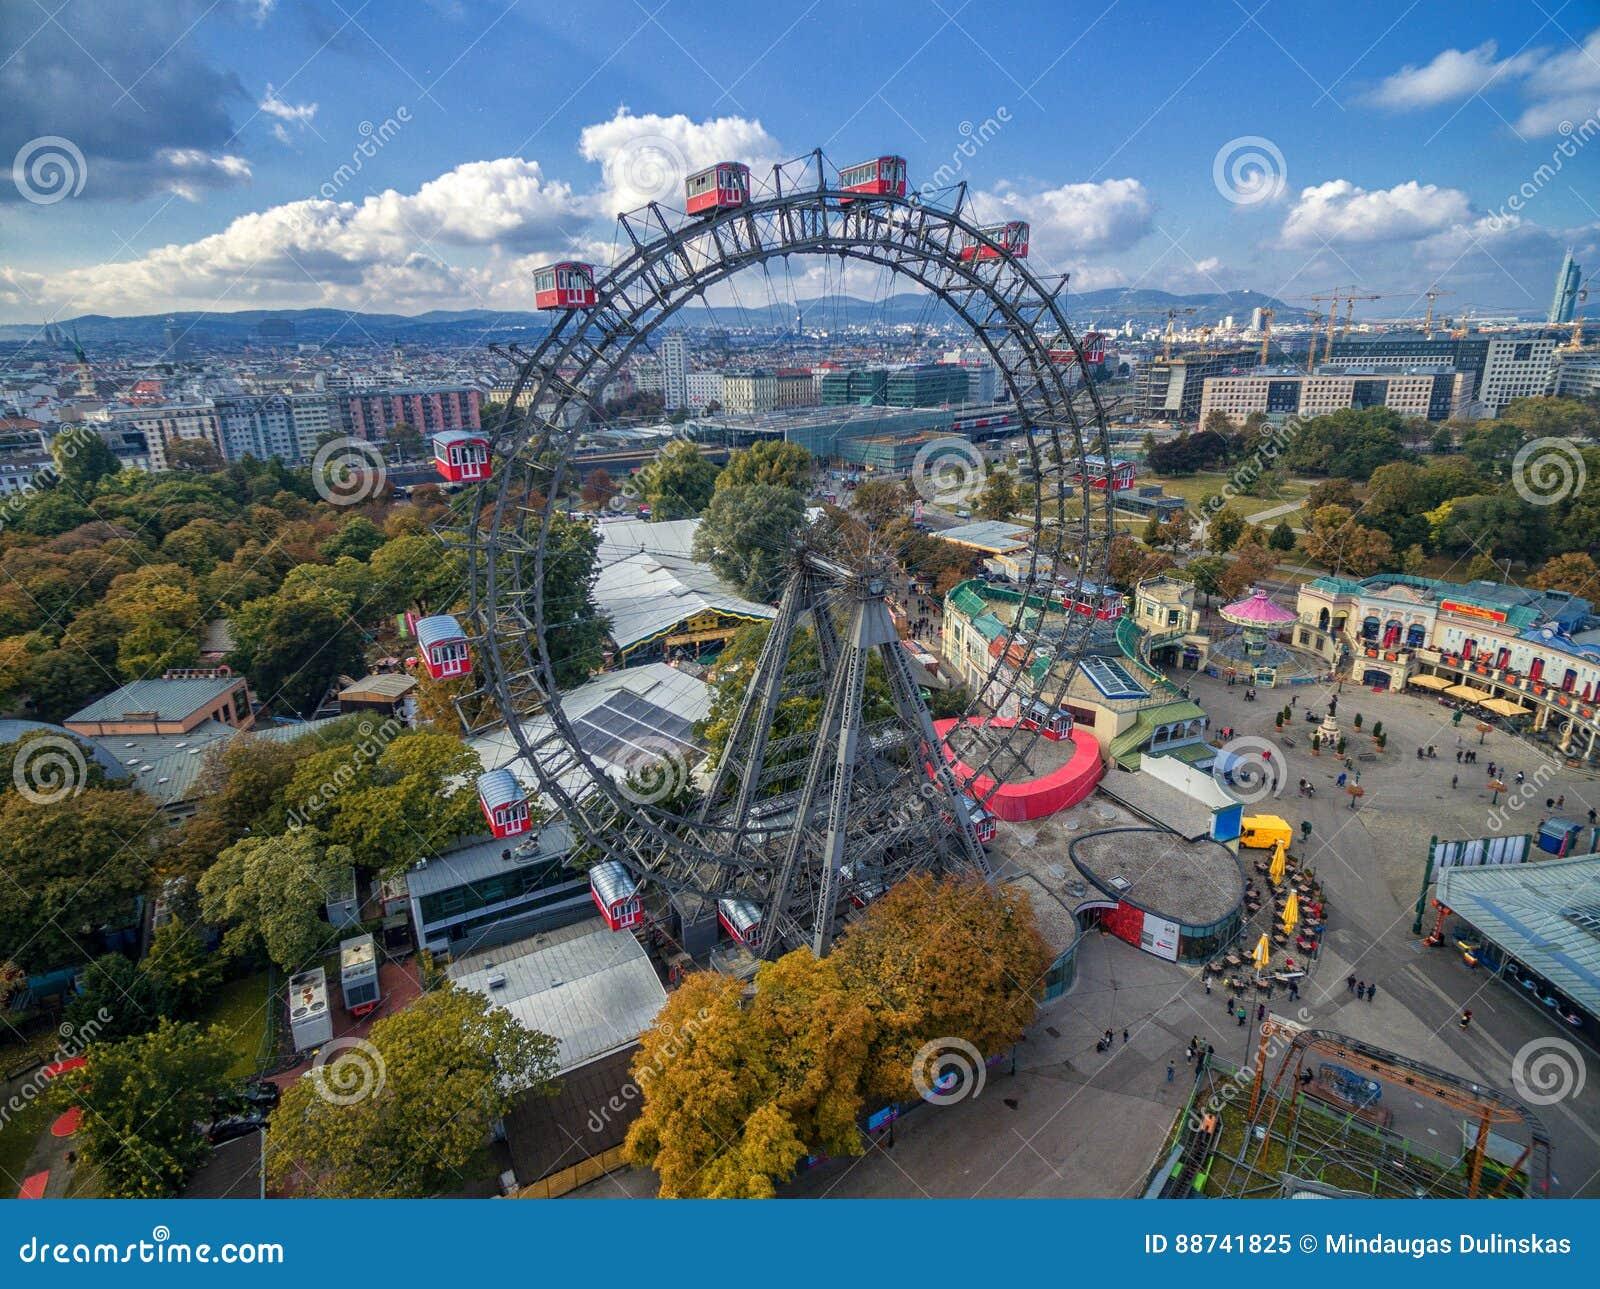 VIENNA, AUSTRIA - 7 OTTOBRE 2016: Ferris Wheel gigante La salciccia Riesenrad era la ruota panoramica extant più alta del ` s del